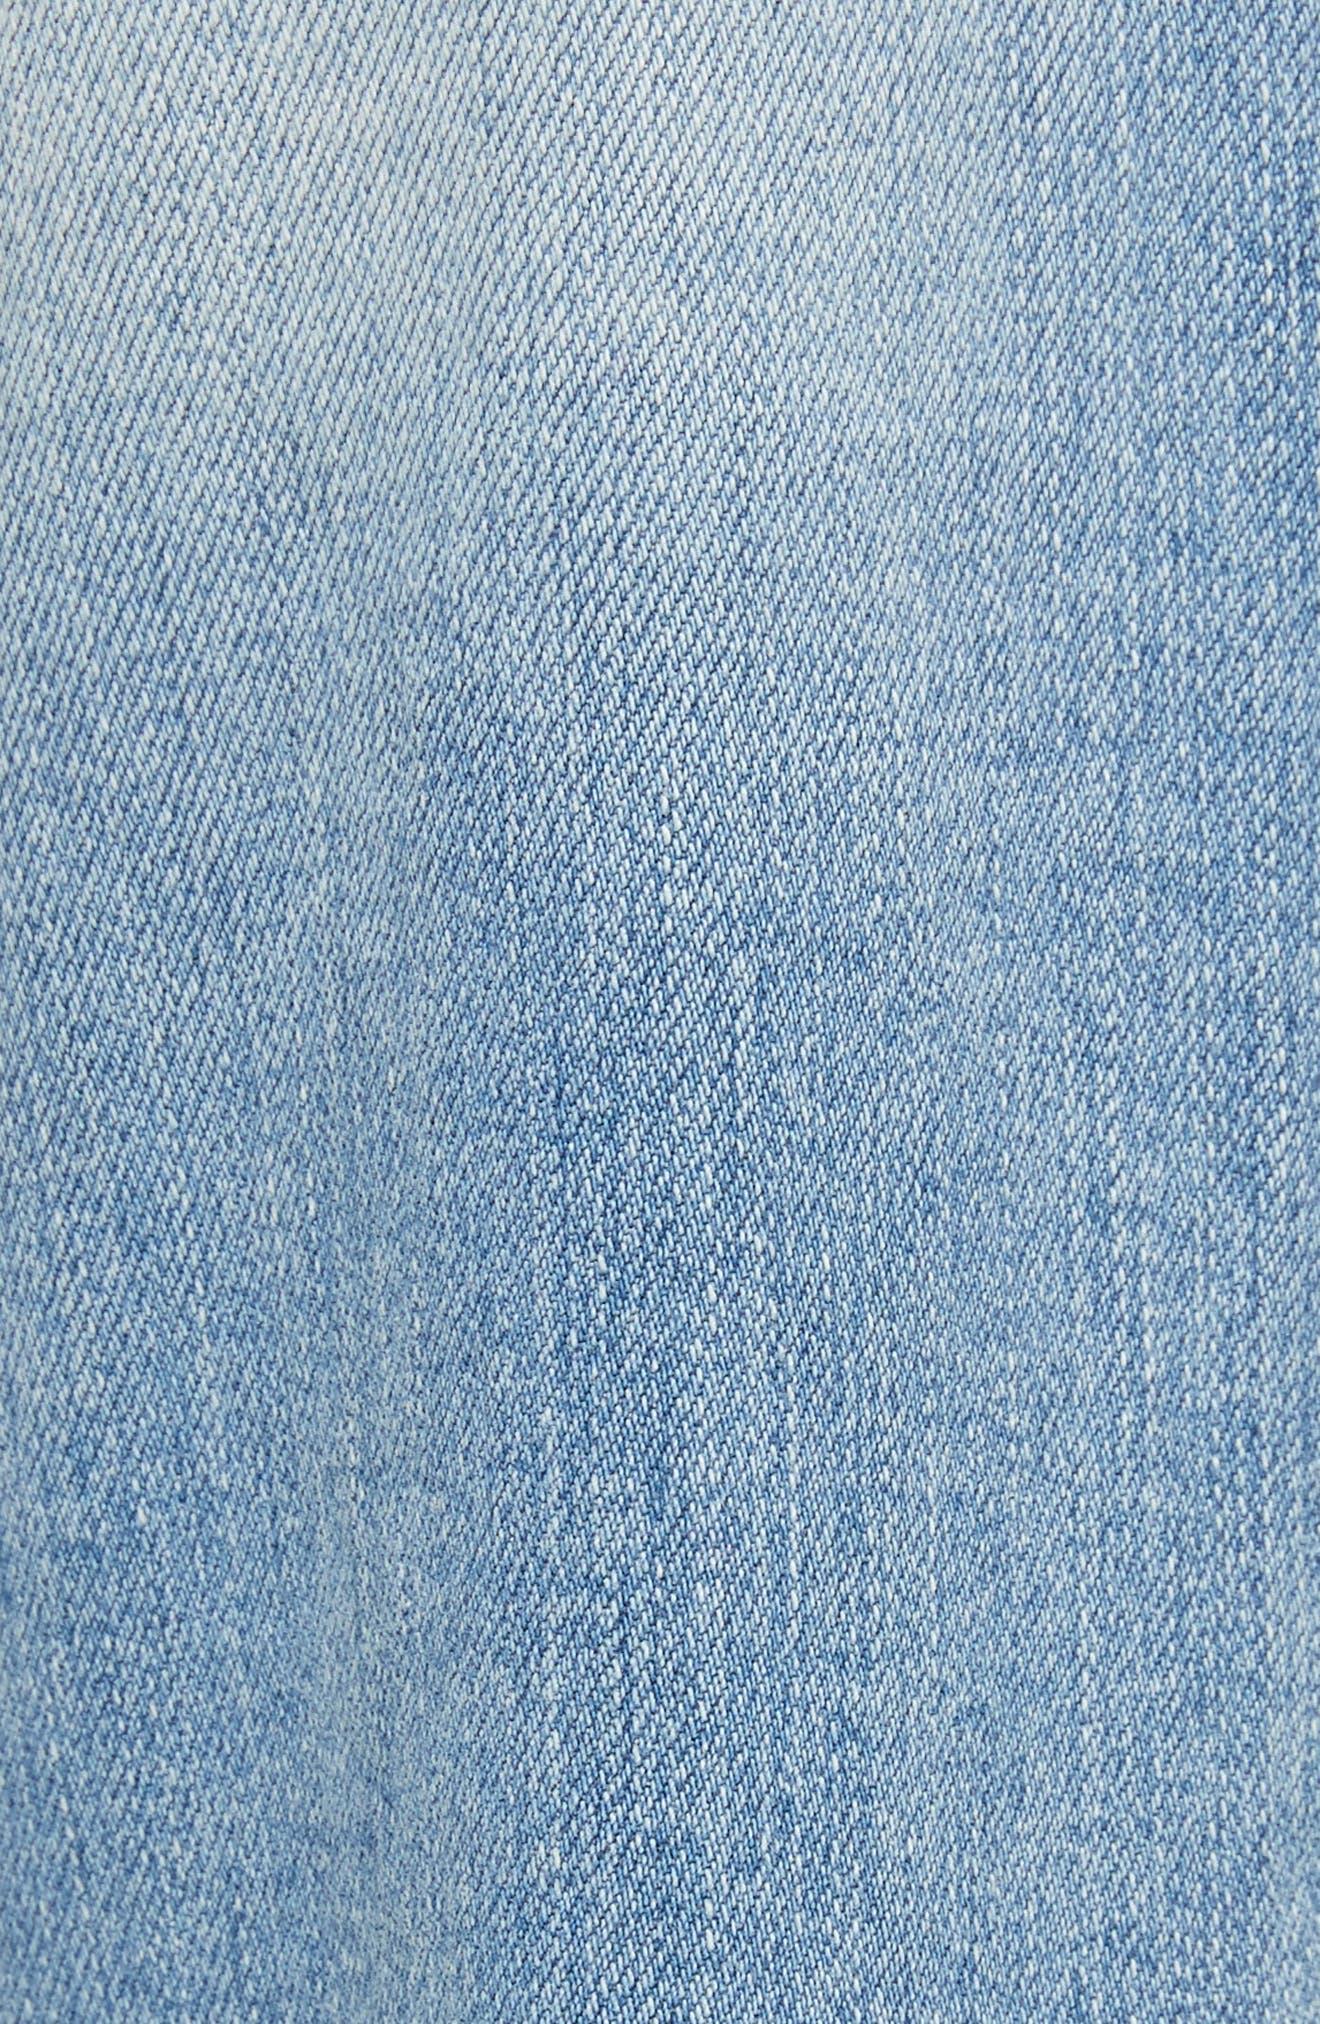 Josalind Straight Leg Crop Jeans,                             Alternate thumbnail 5, color,                             479